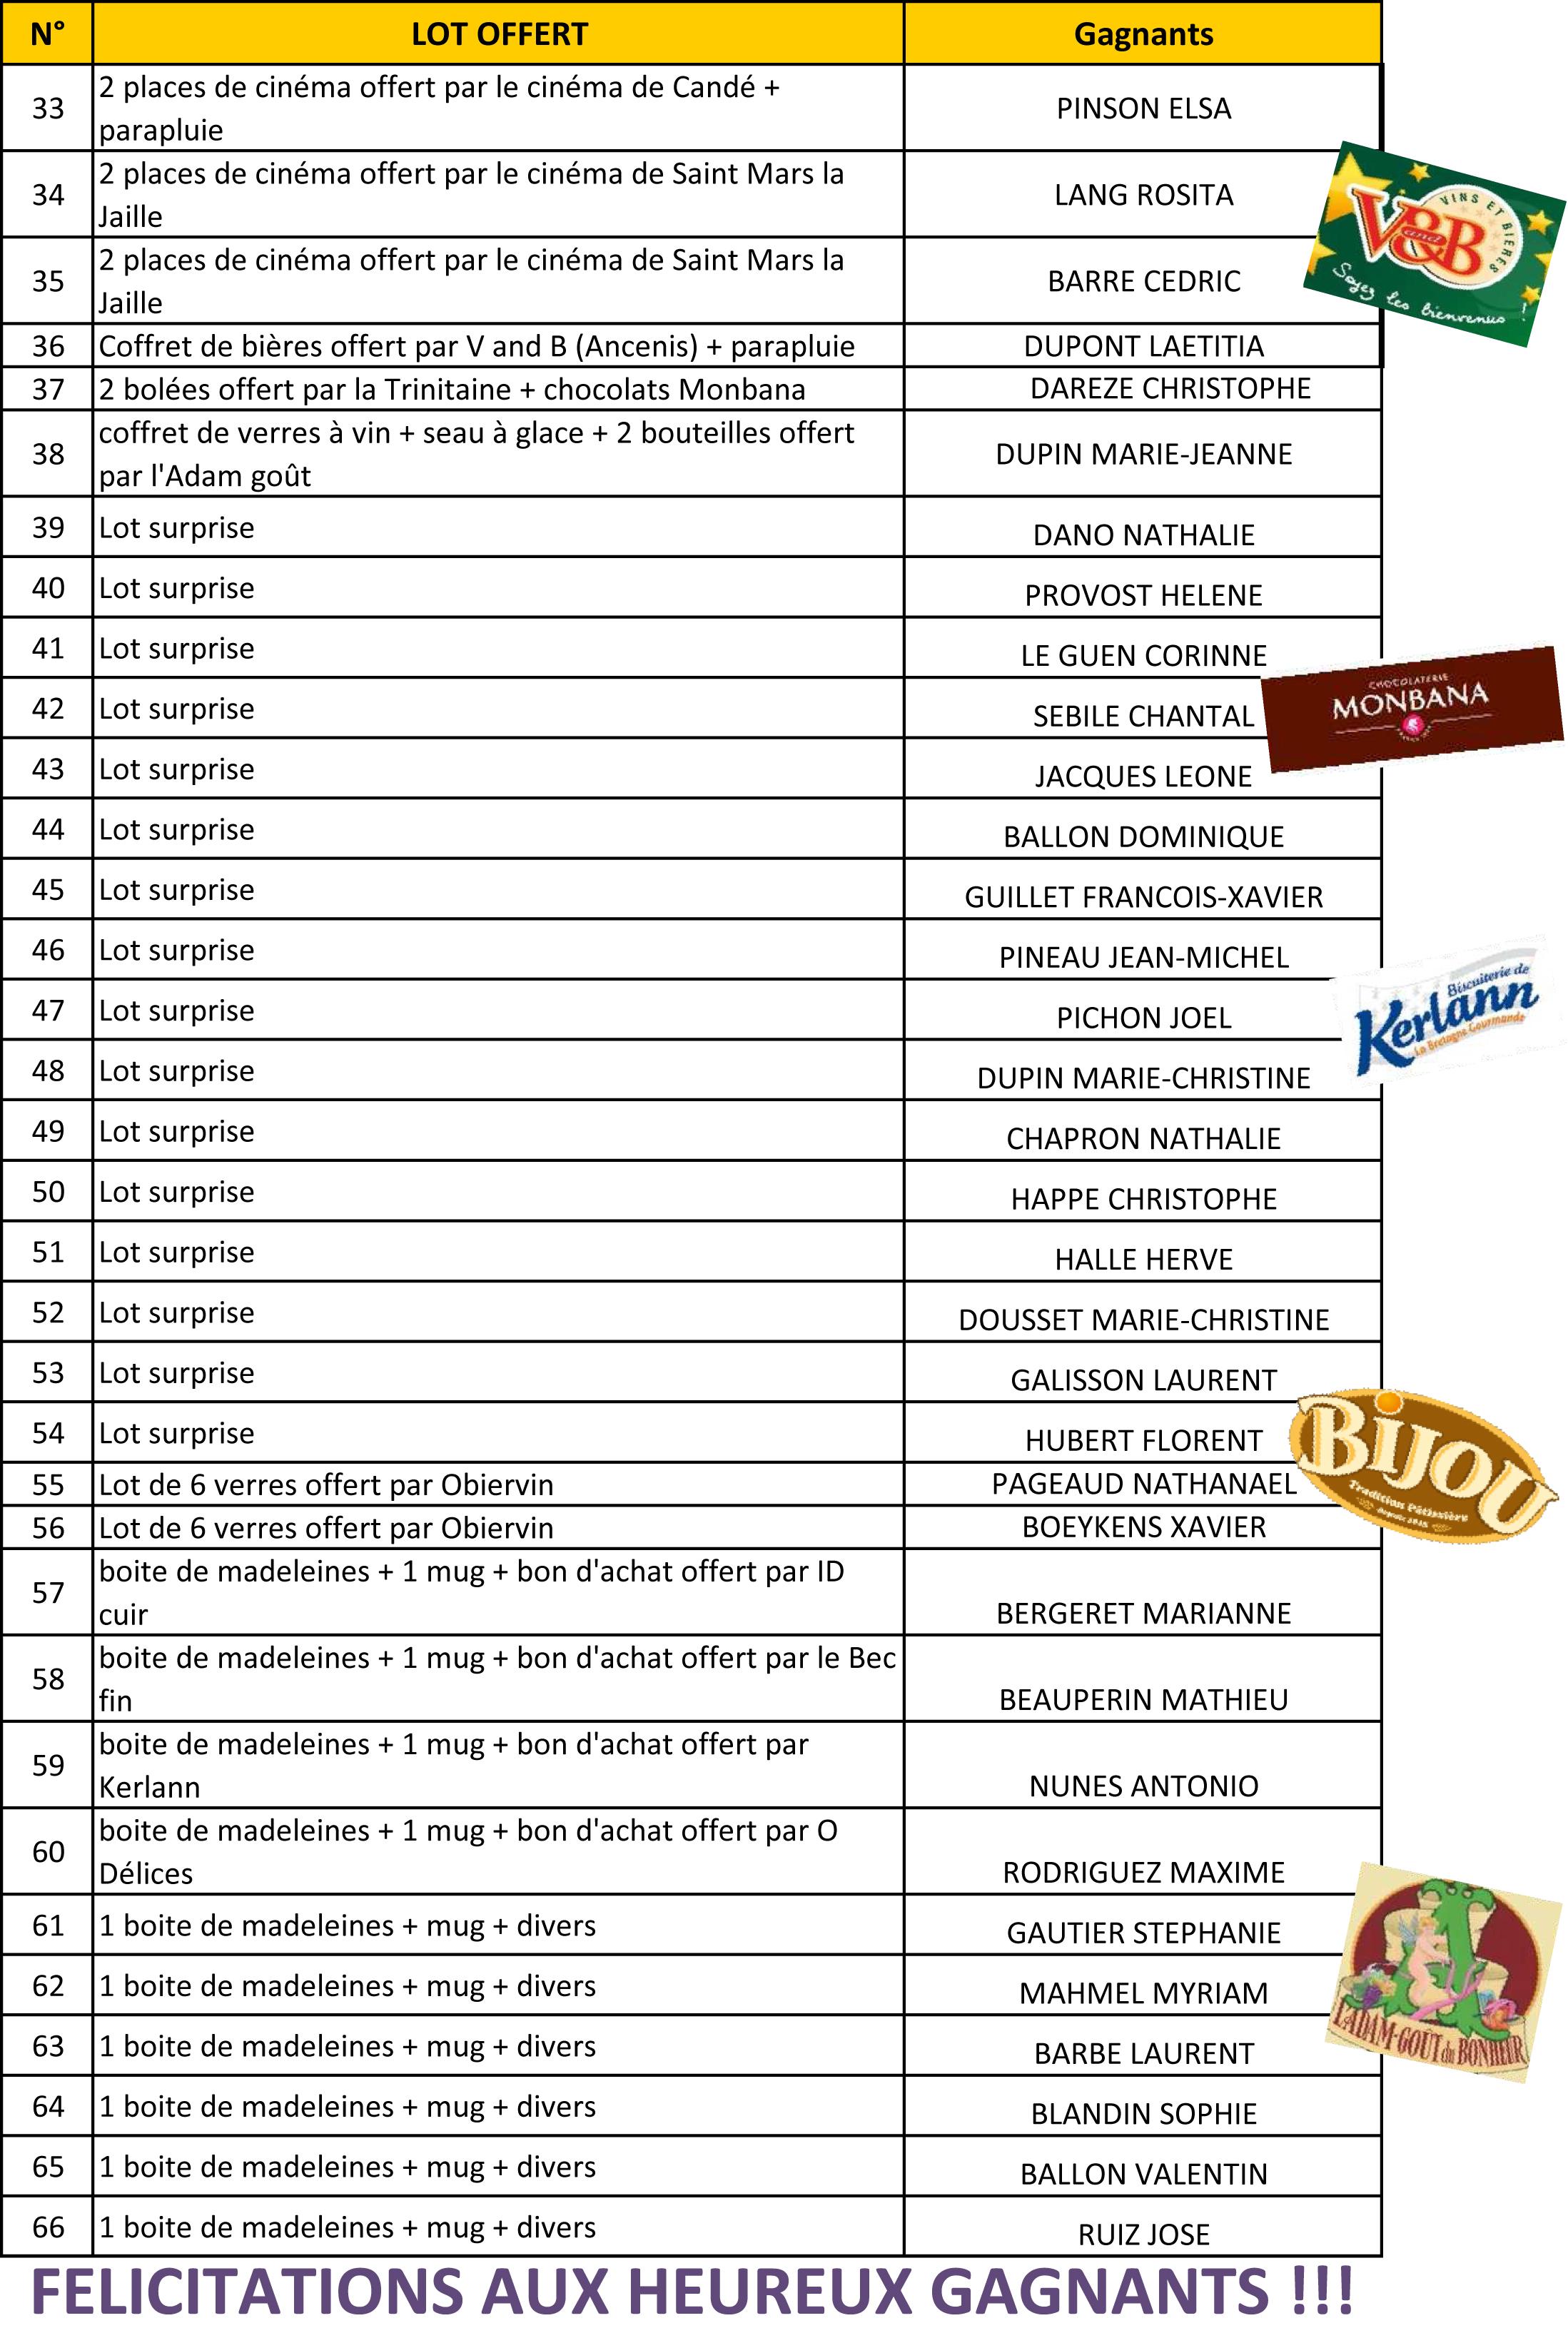 liste des gagnants